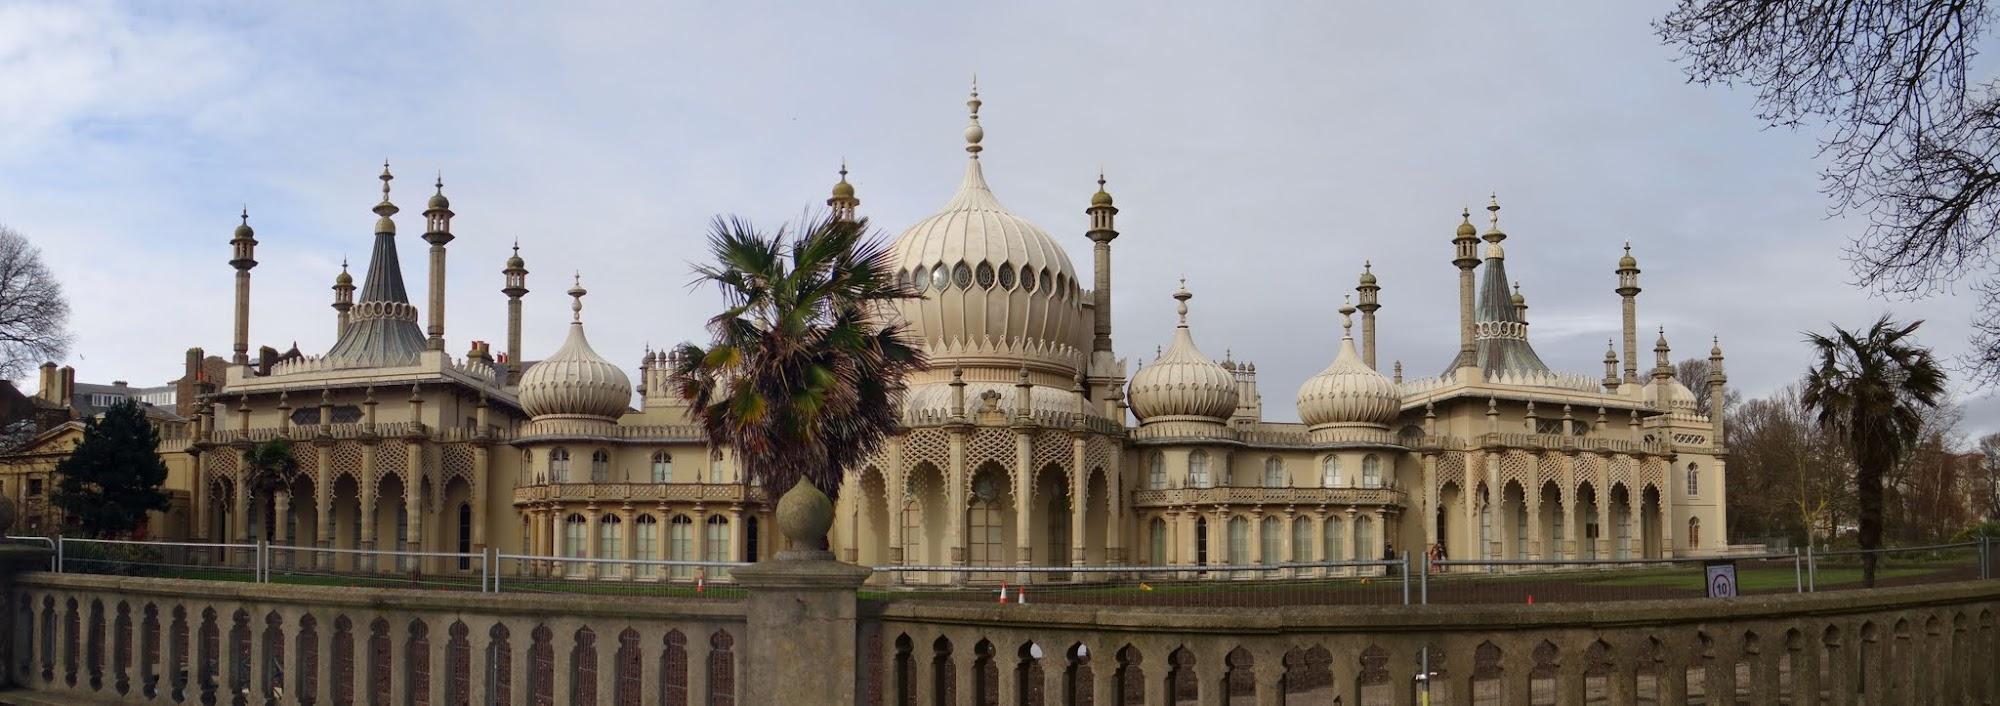 Brighton_094.jpg